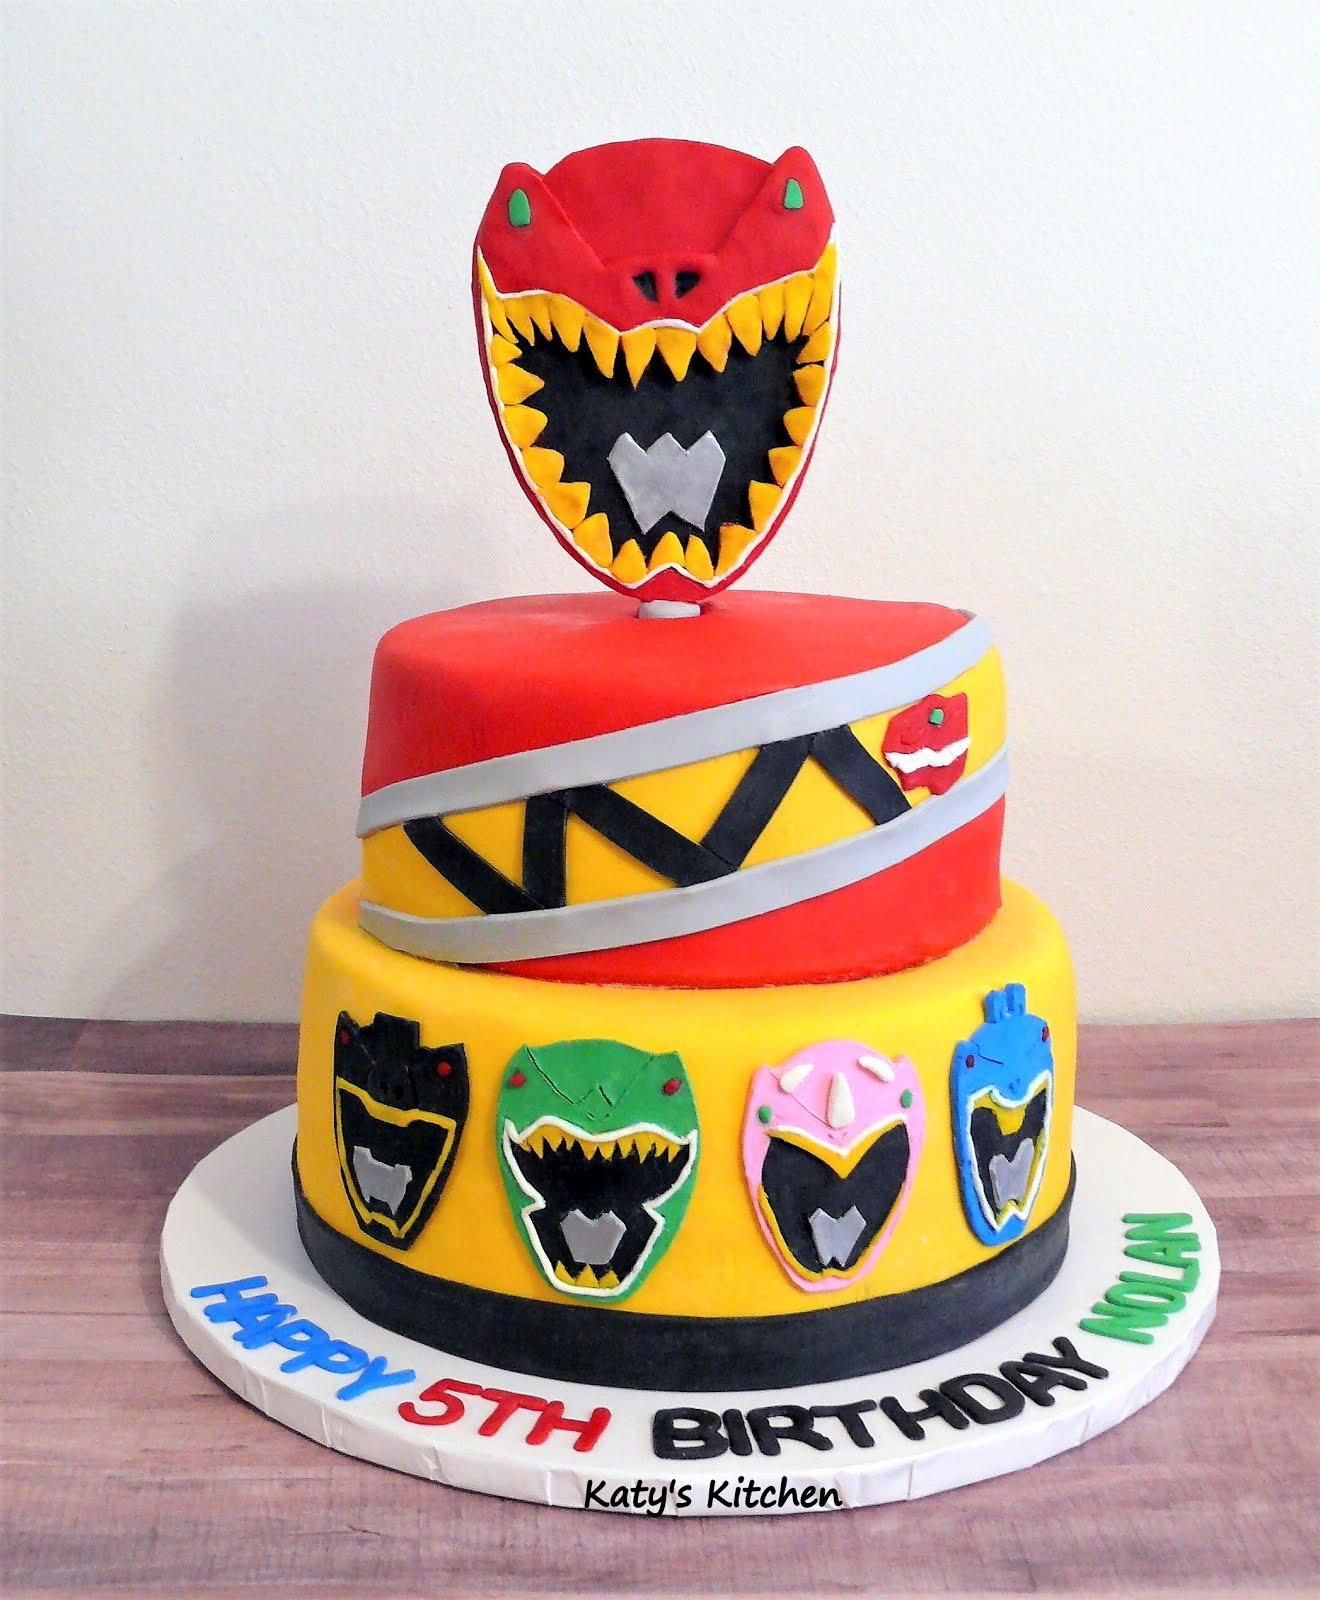 Astonishing Katys Kitchen Power Rangers Dino Charge Cake Birthday Cards Printable Opercafe Filternl